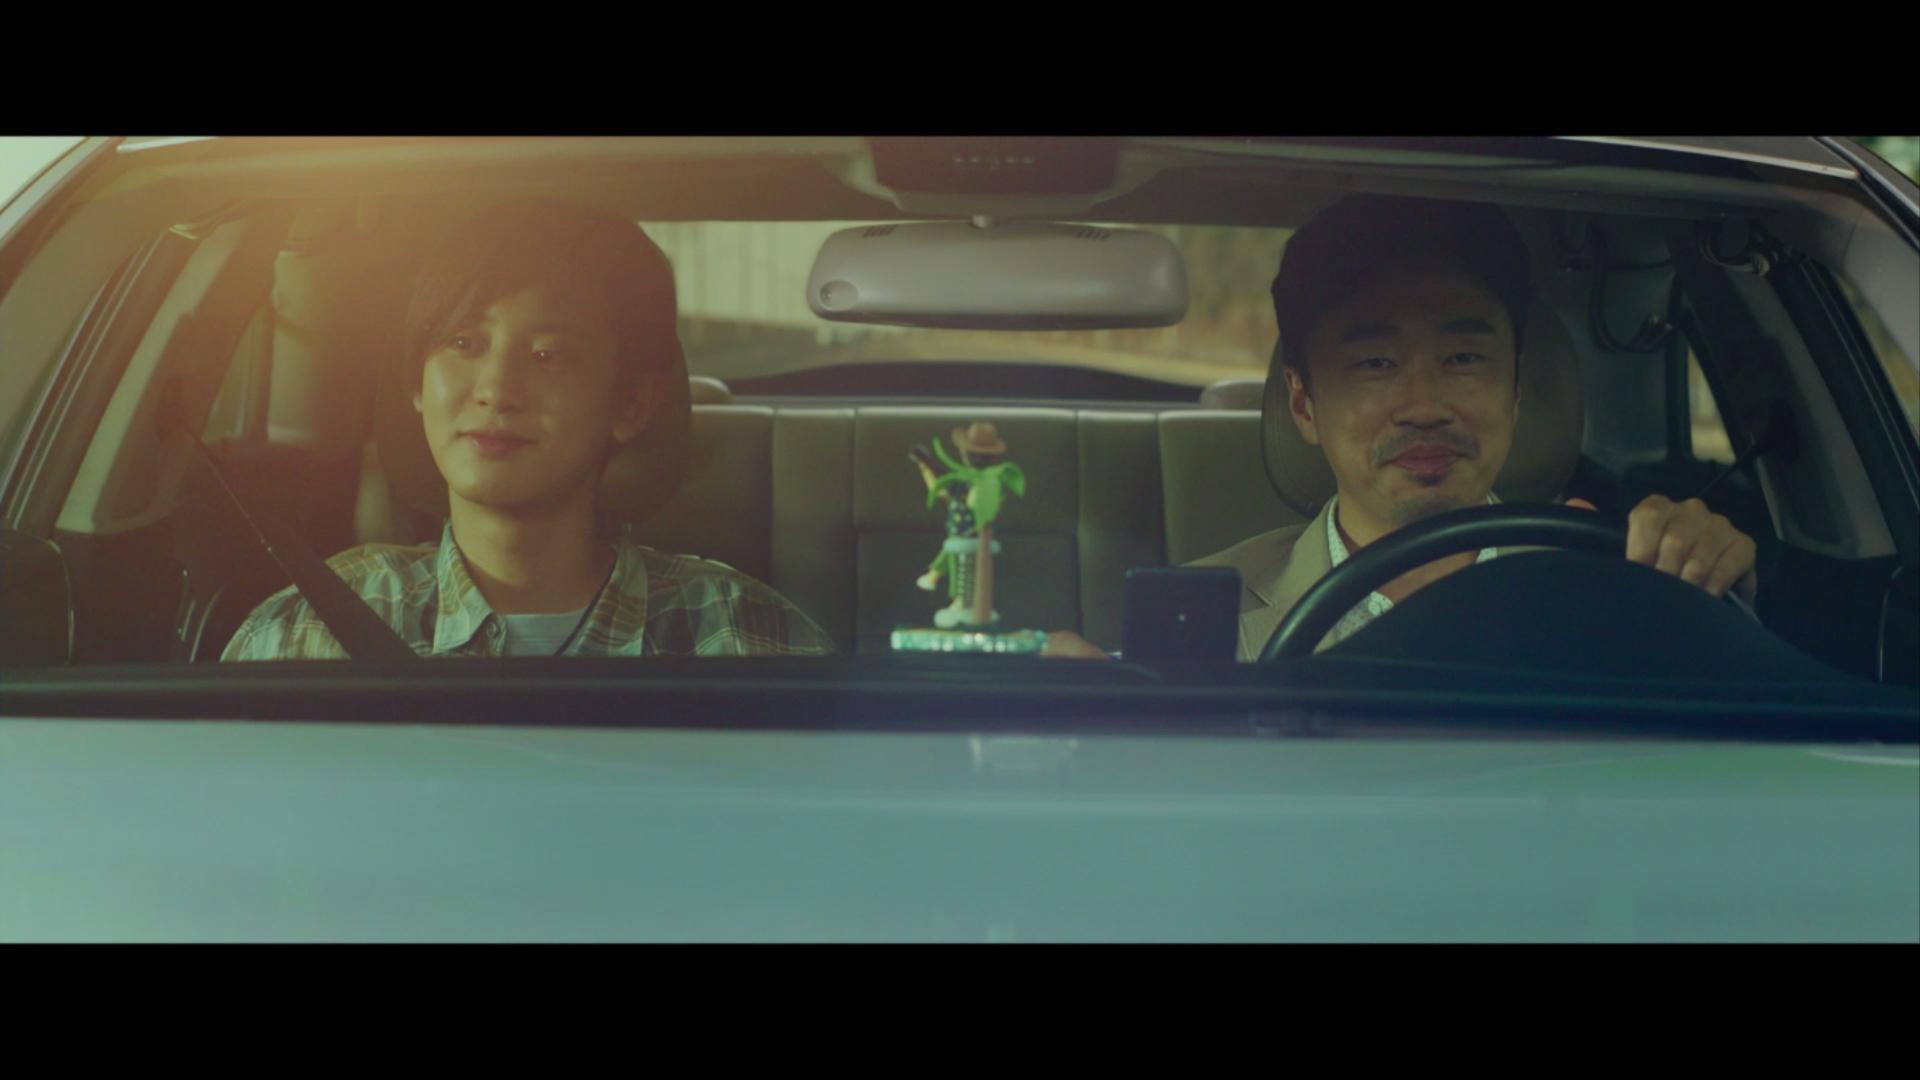 [THE BOX OST] CHANYEOL 찬열 '비가 (Raining)' Track MV